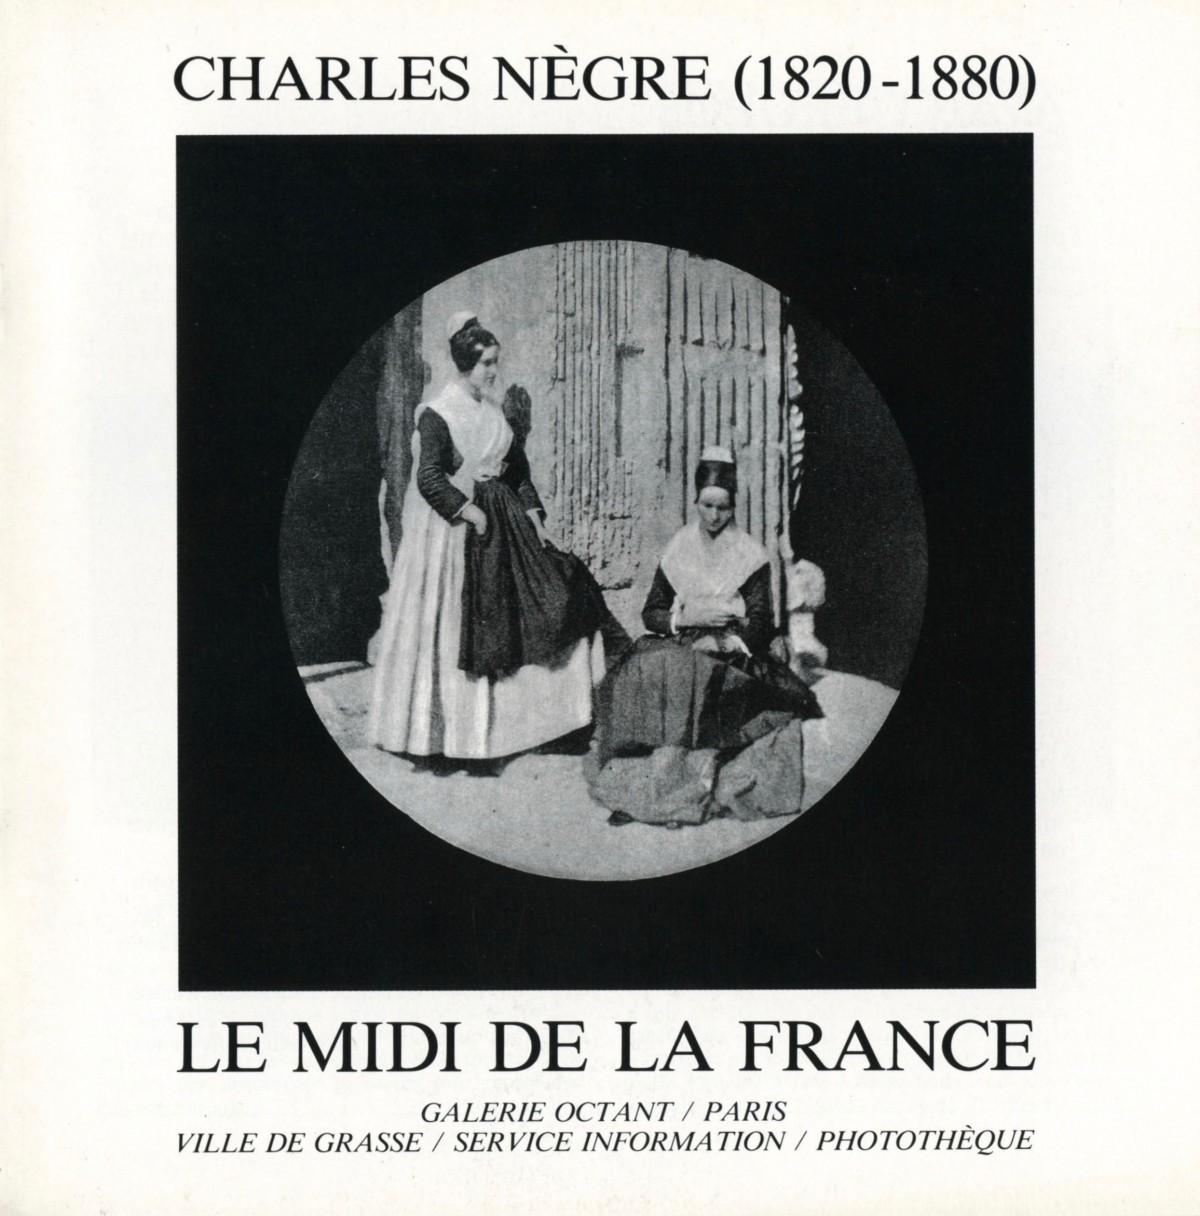 charles-nègre-françoise-paviot